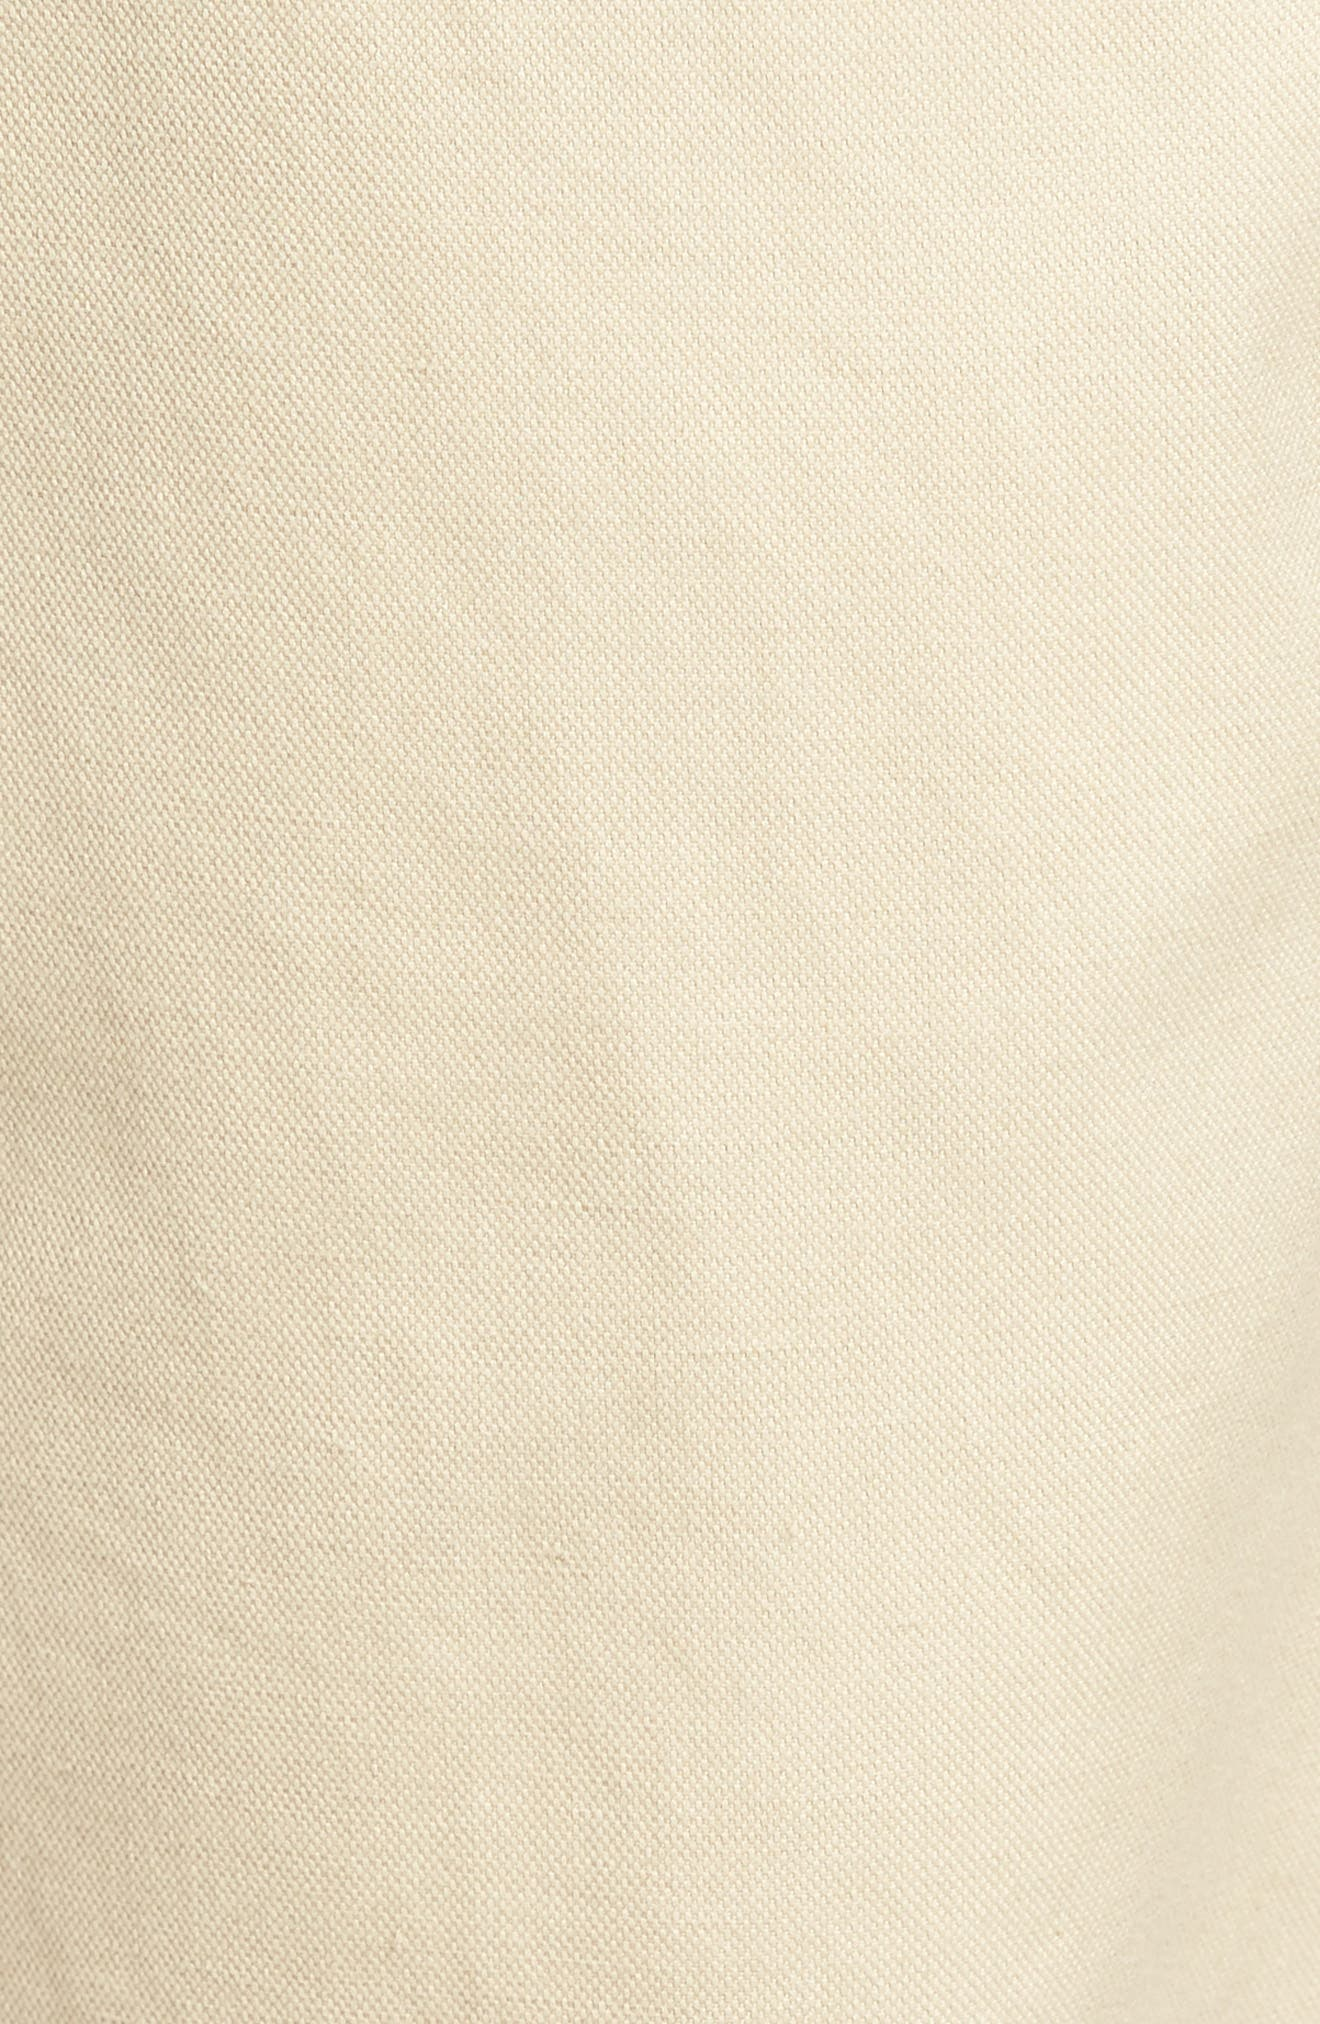 Aegean Lounger Shorts,                             Alternate thumbnail 5, color,                             200